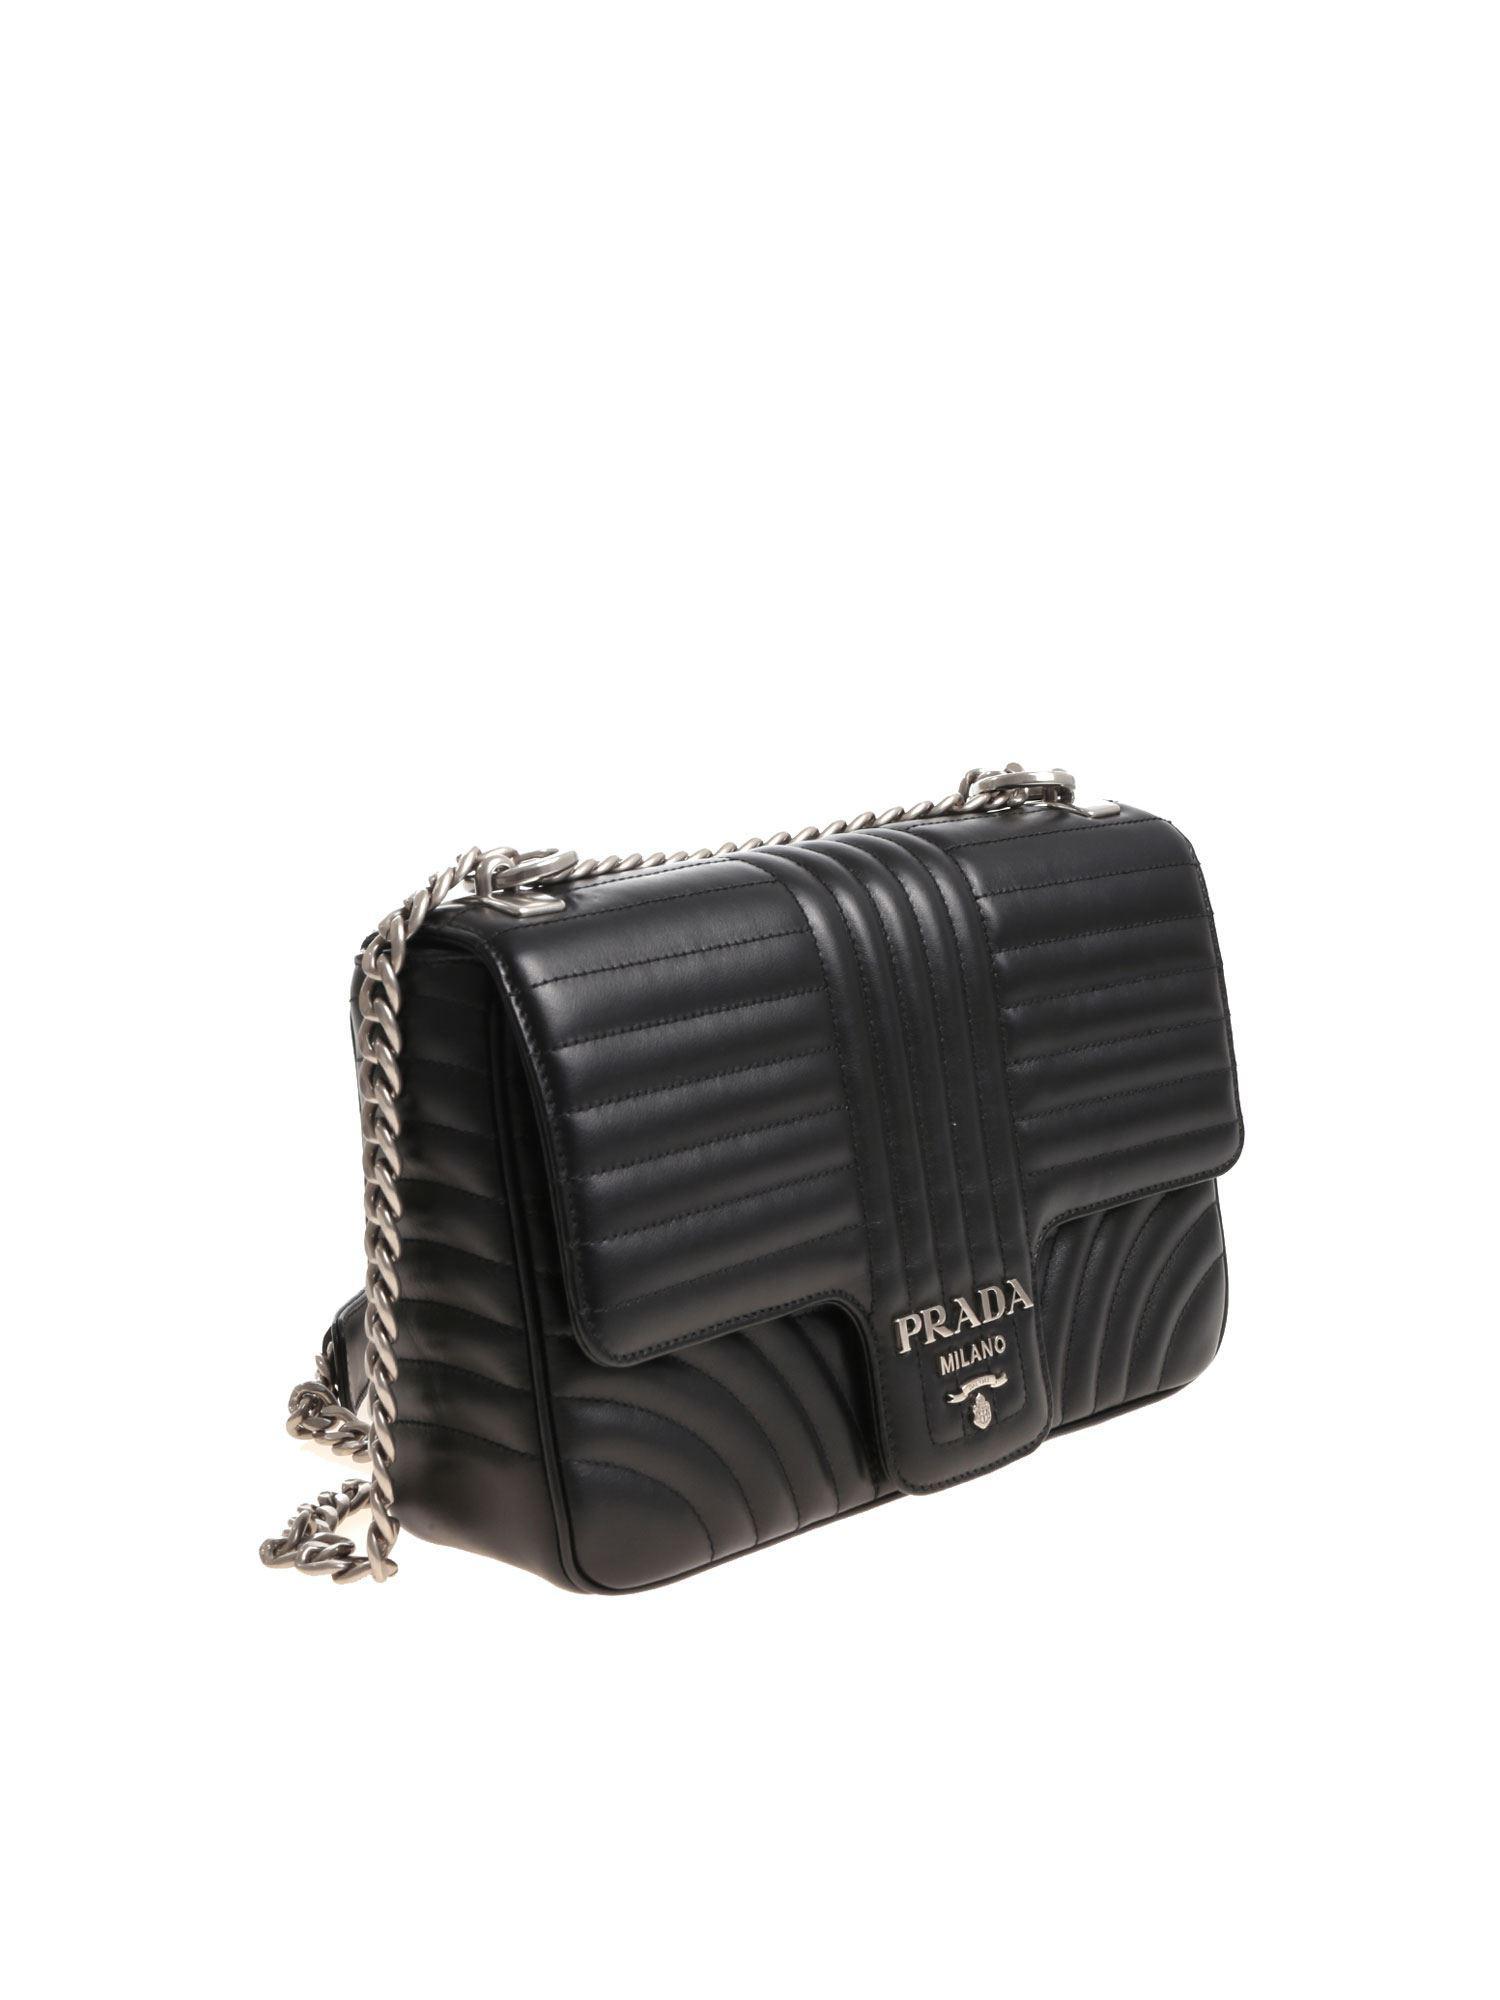 e6e6fe60974fbd Lyst - Prada Quilted Black Leather Shoulder Bag in Black - Save 10%